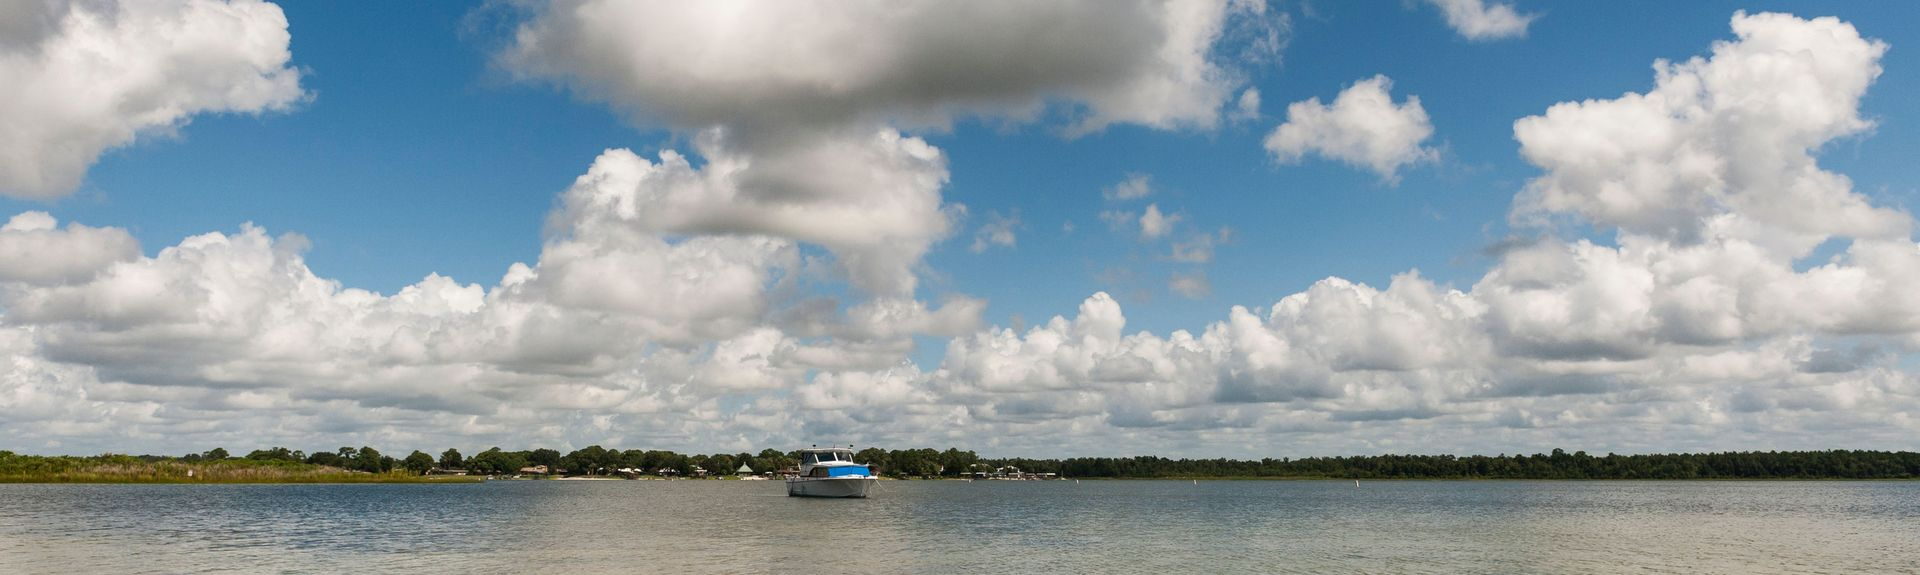 Lake Weir, Ocklawaha, Florida, United States of America